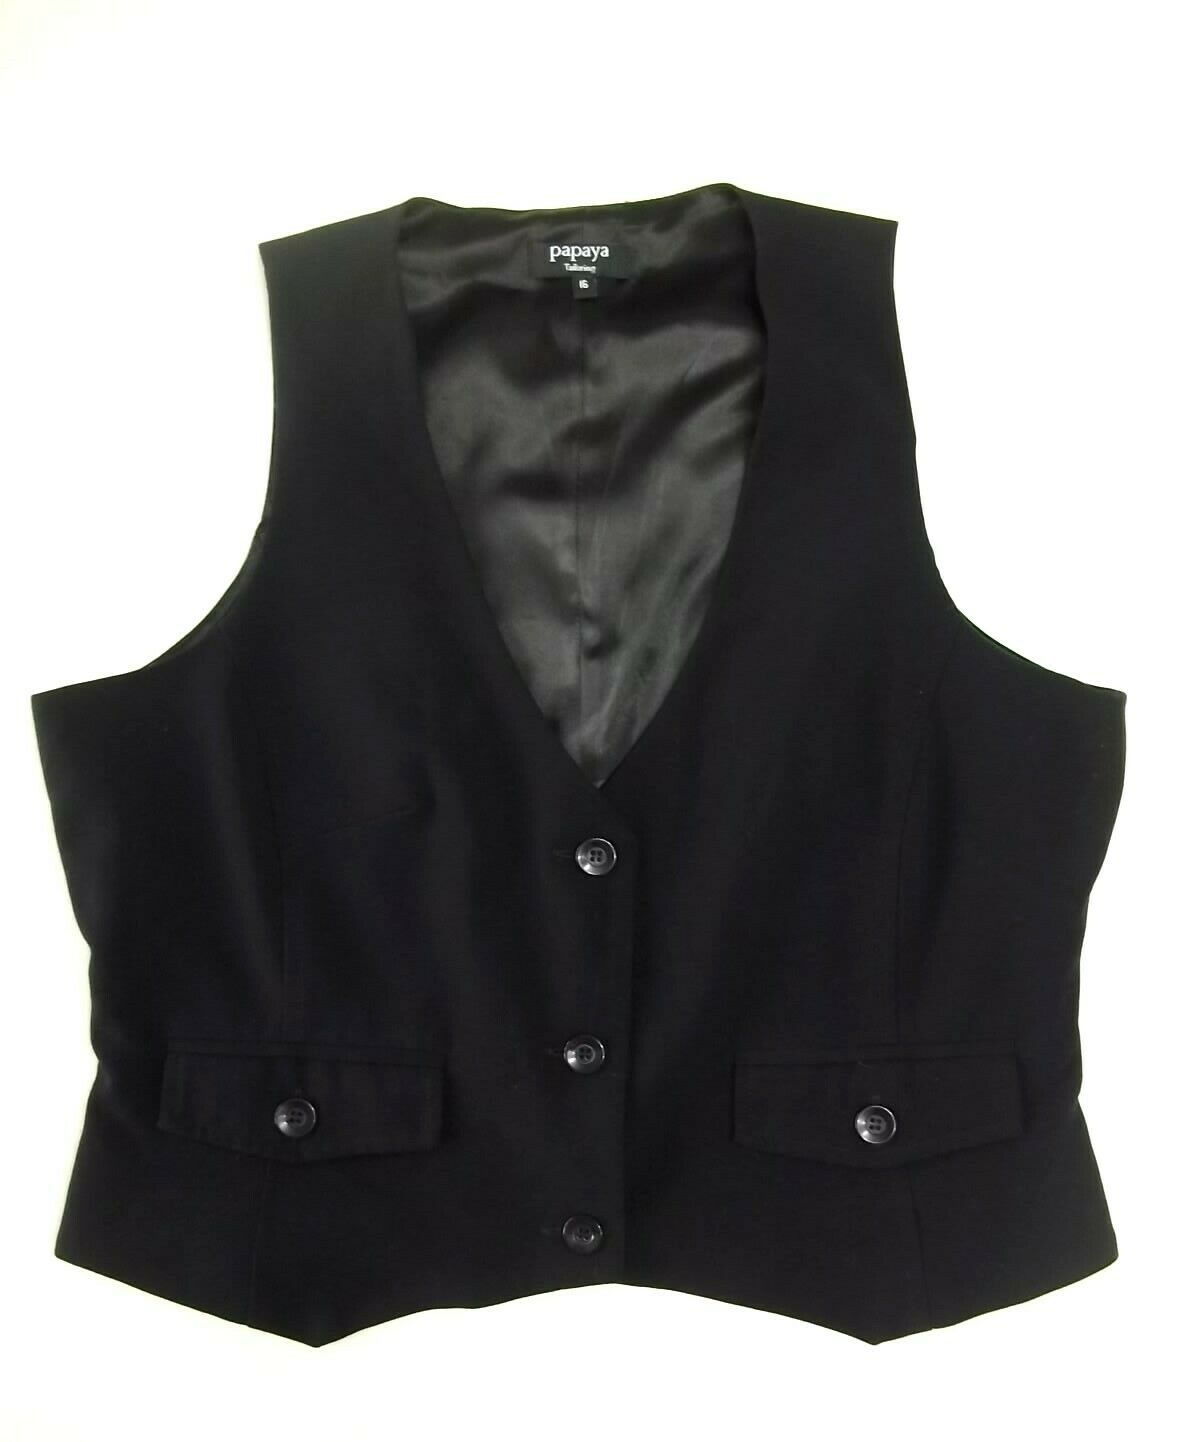 Ladies smart waistcoat Size 16 Papaya Black Lined Lovely condition RU1